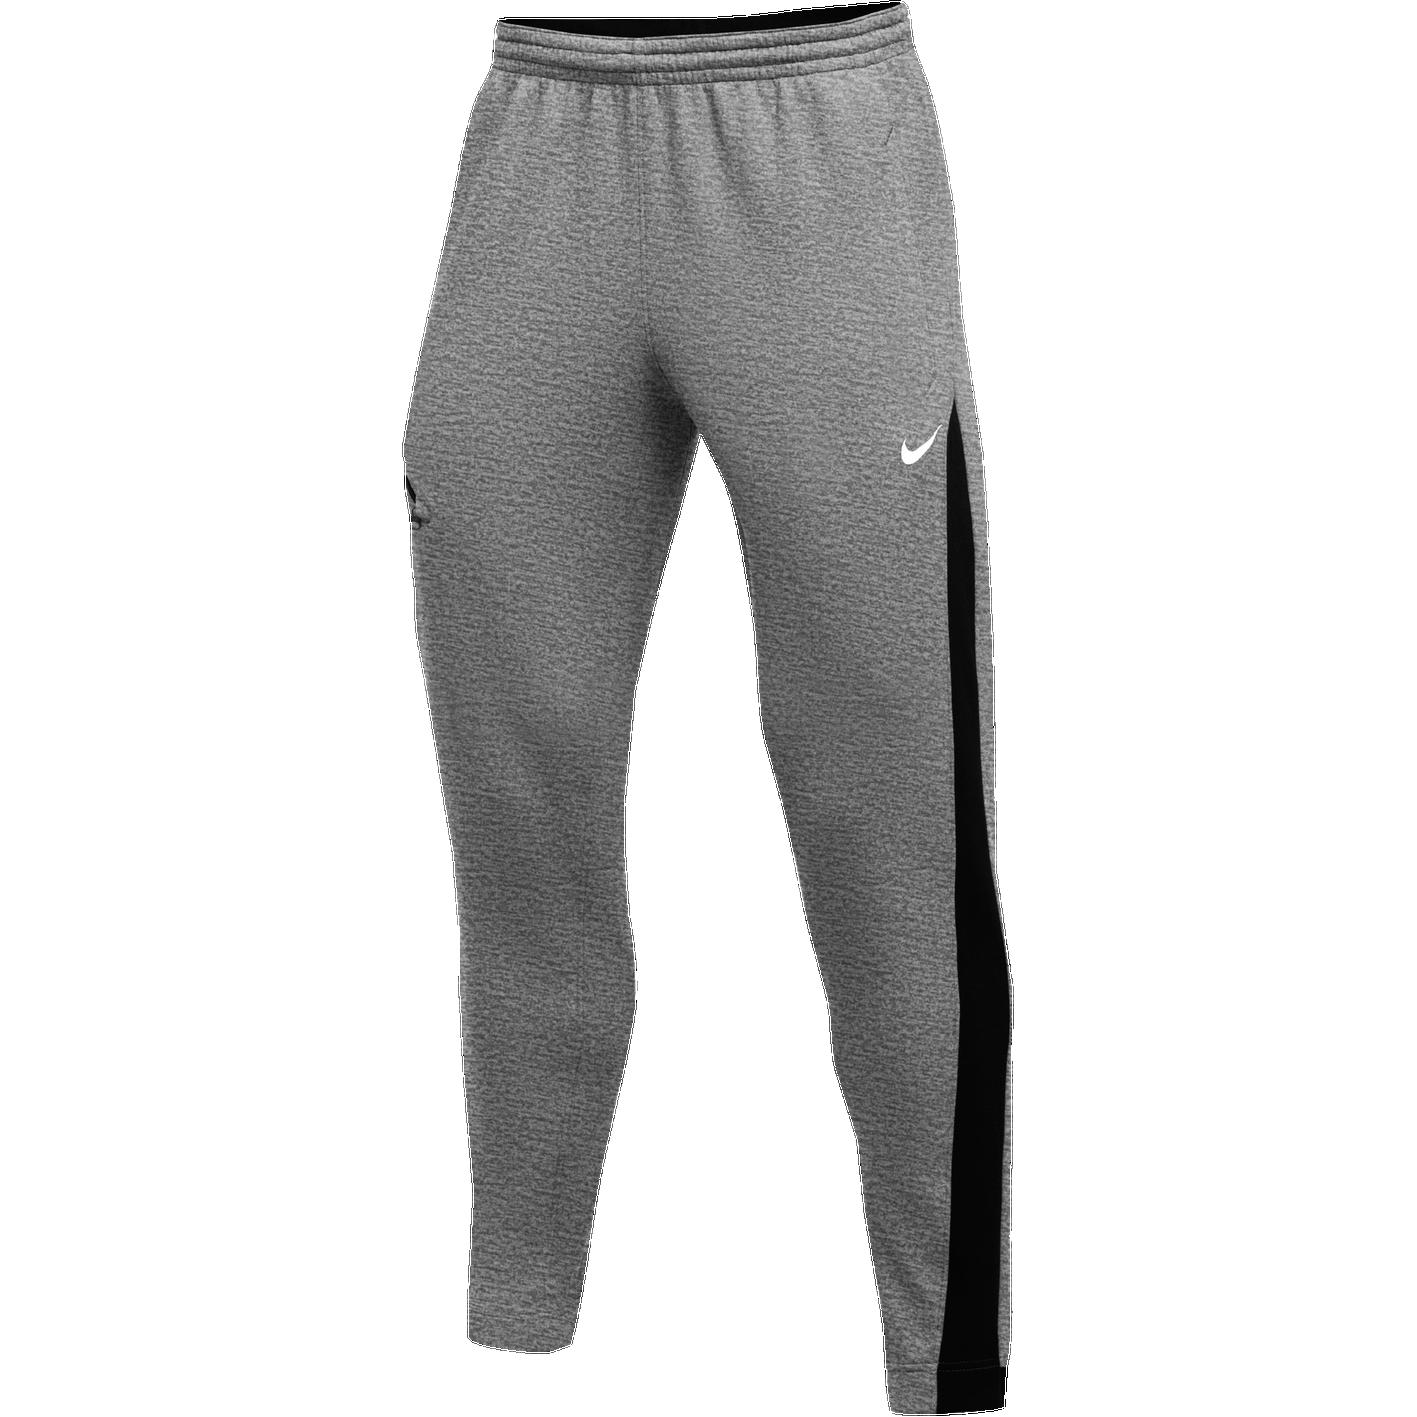 0a53d0c7d407 Nike Team Dry Showtime Pants - Men s - Baseball - Clothing - Cool ...